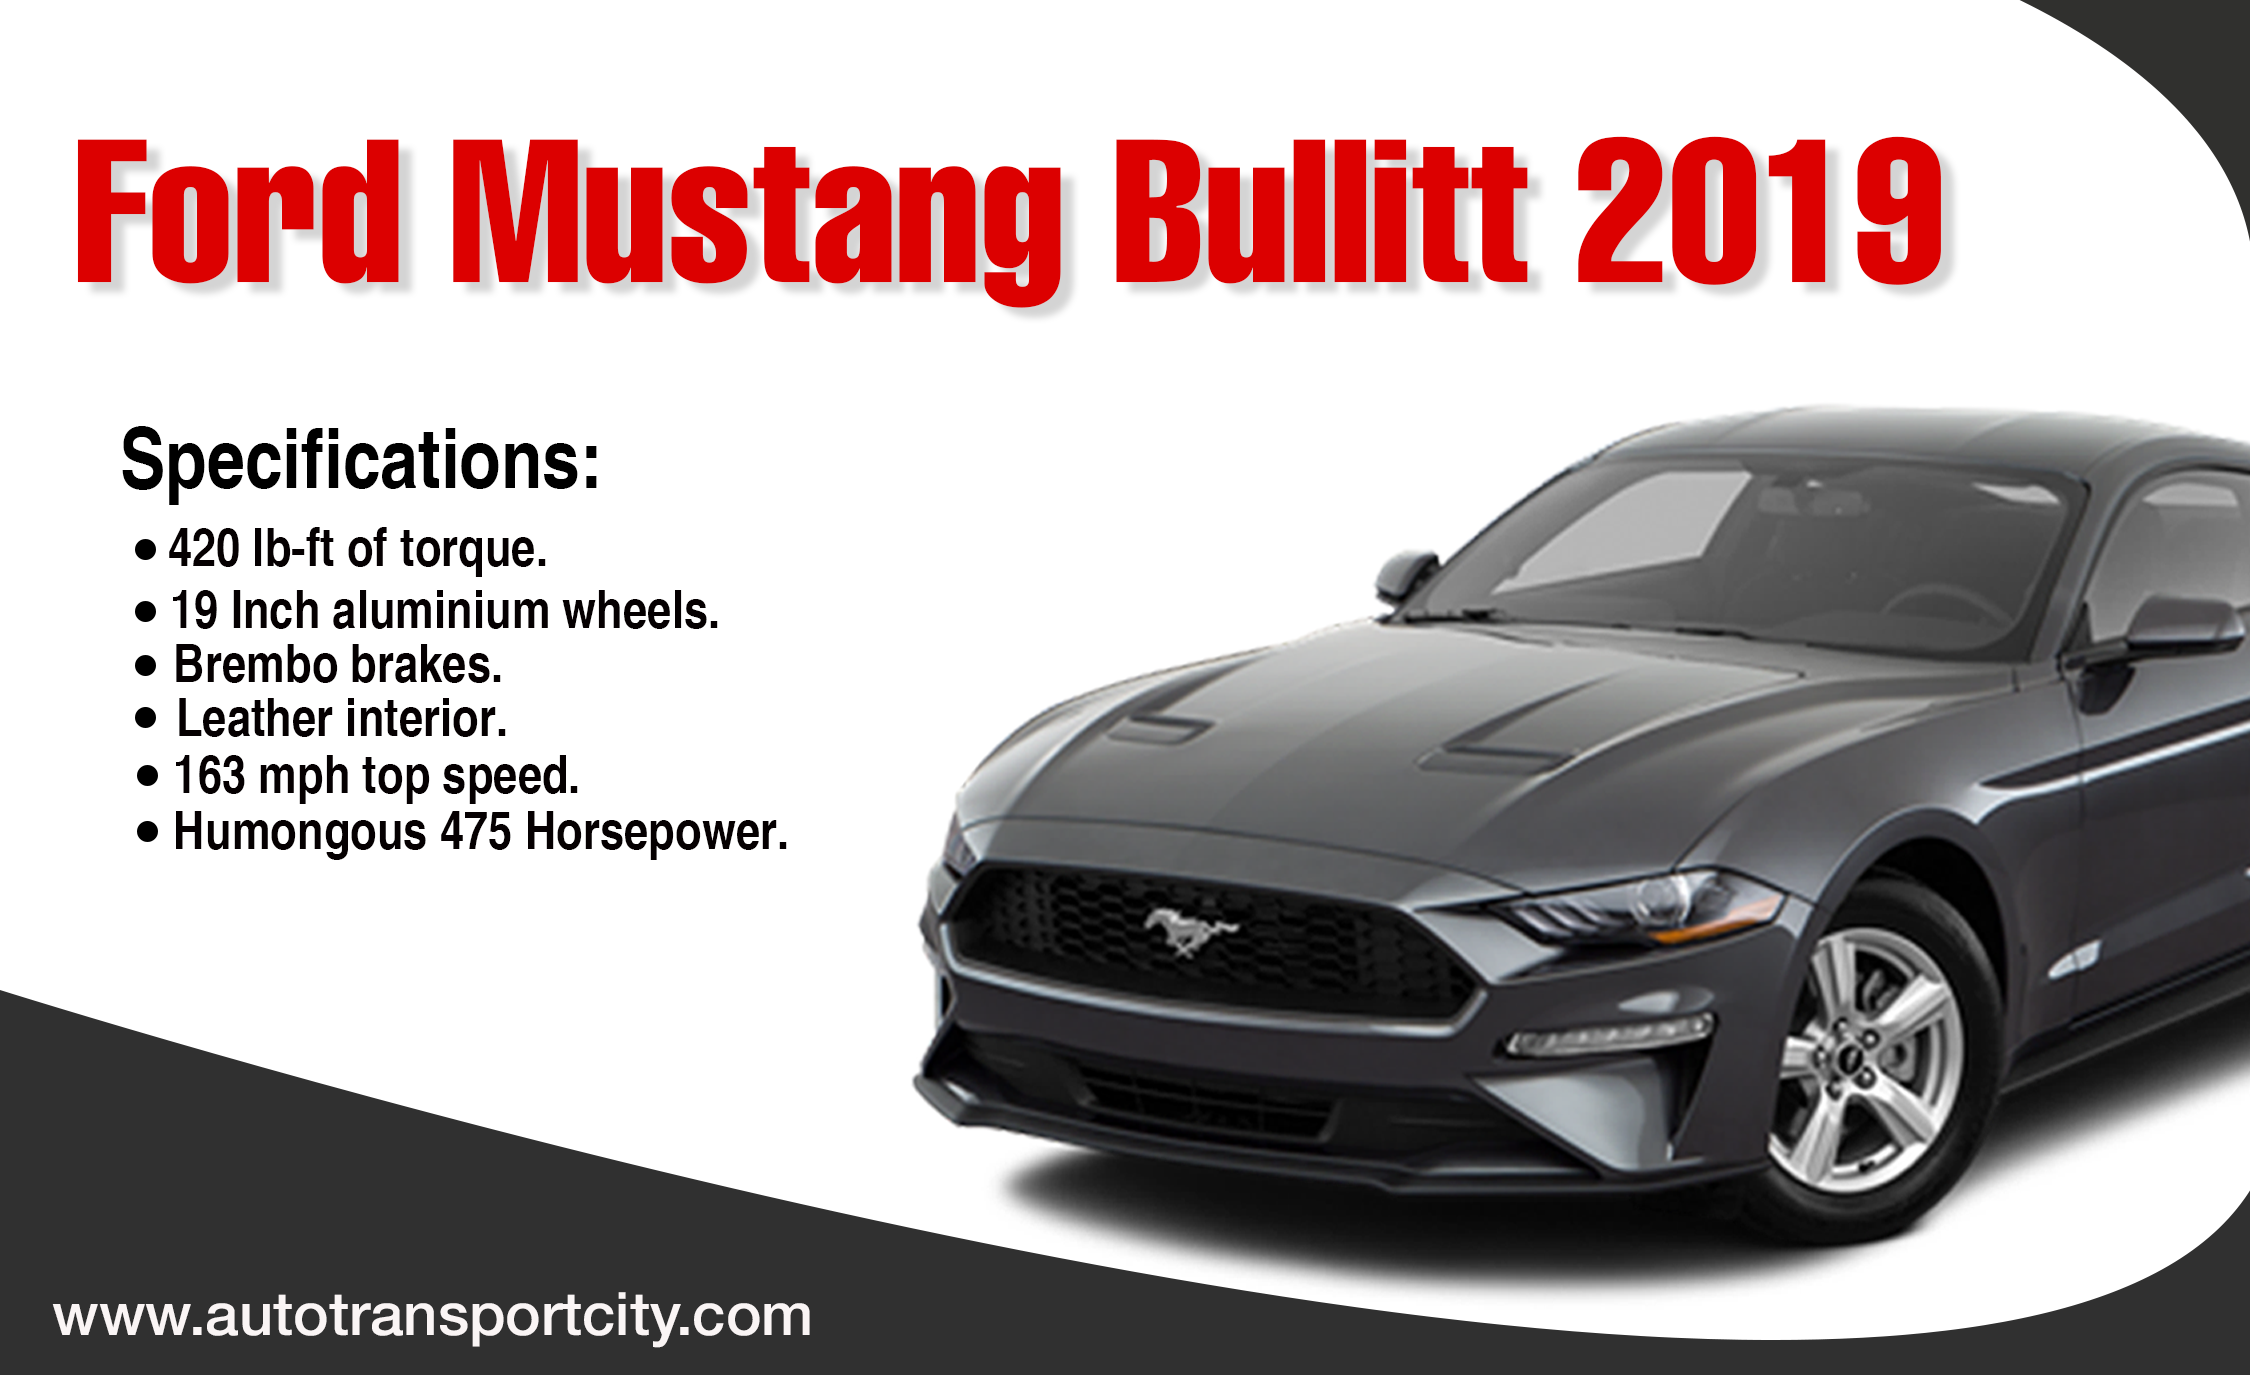 Ford mustang bullitt 2019 -autotransportcity